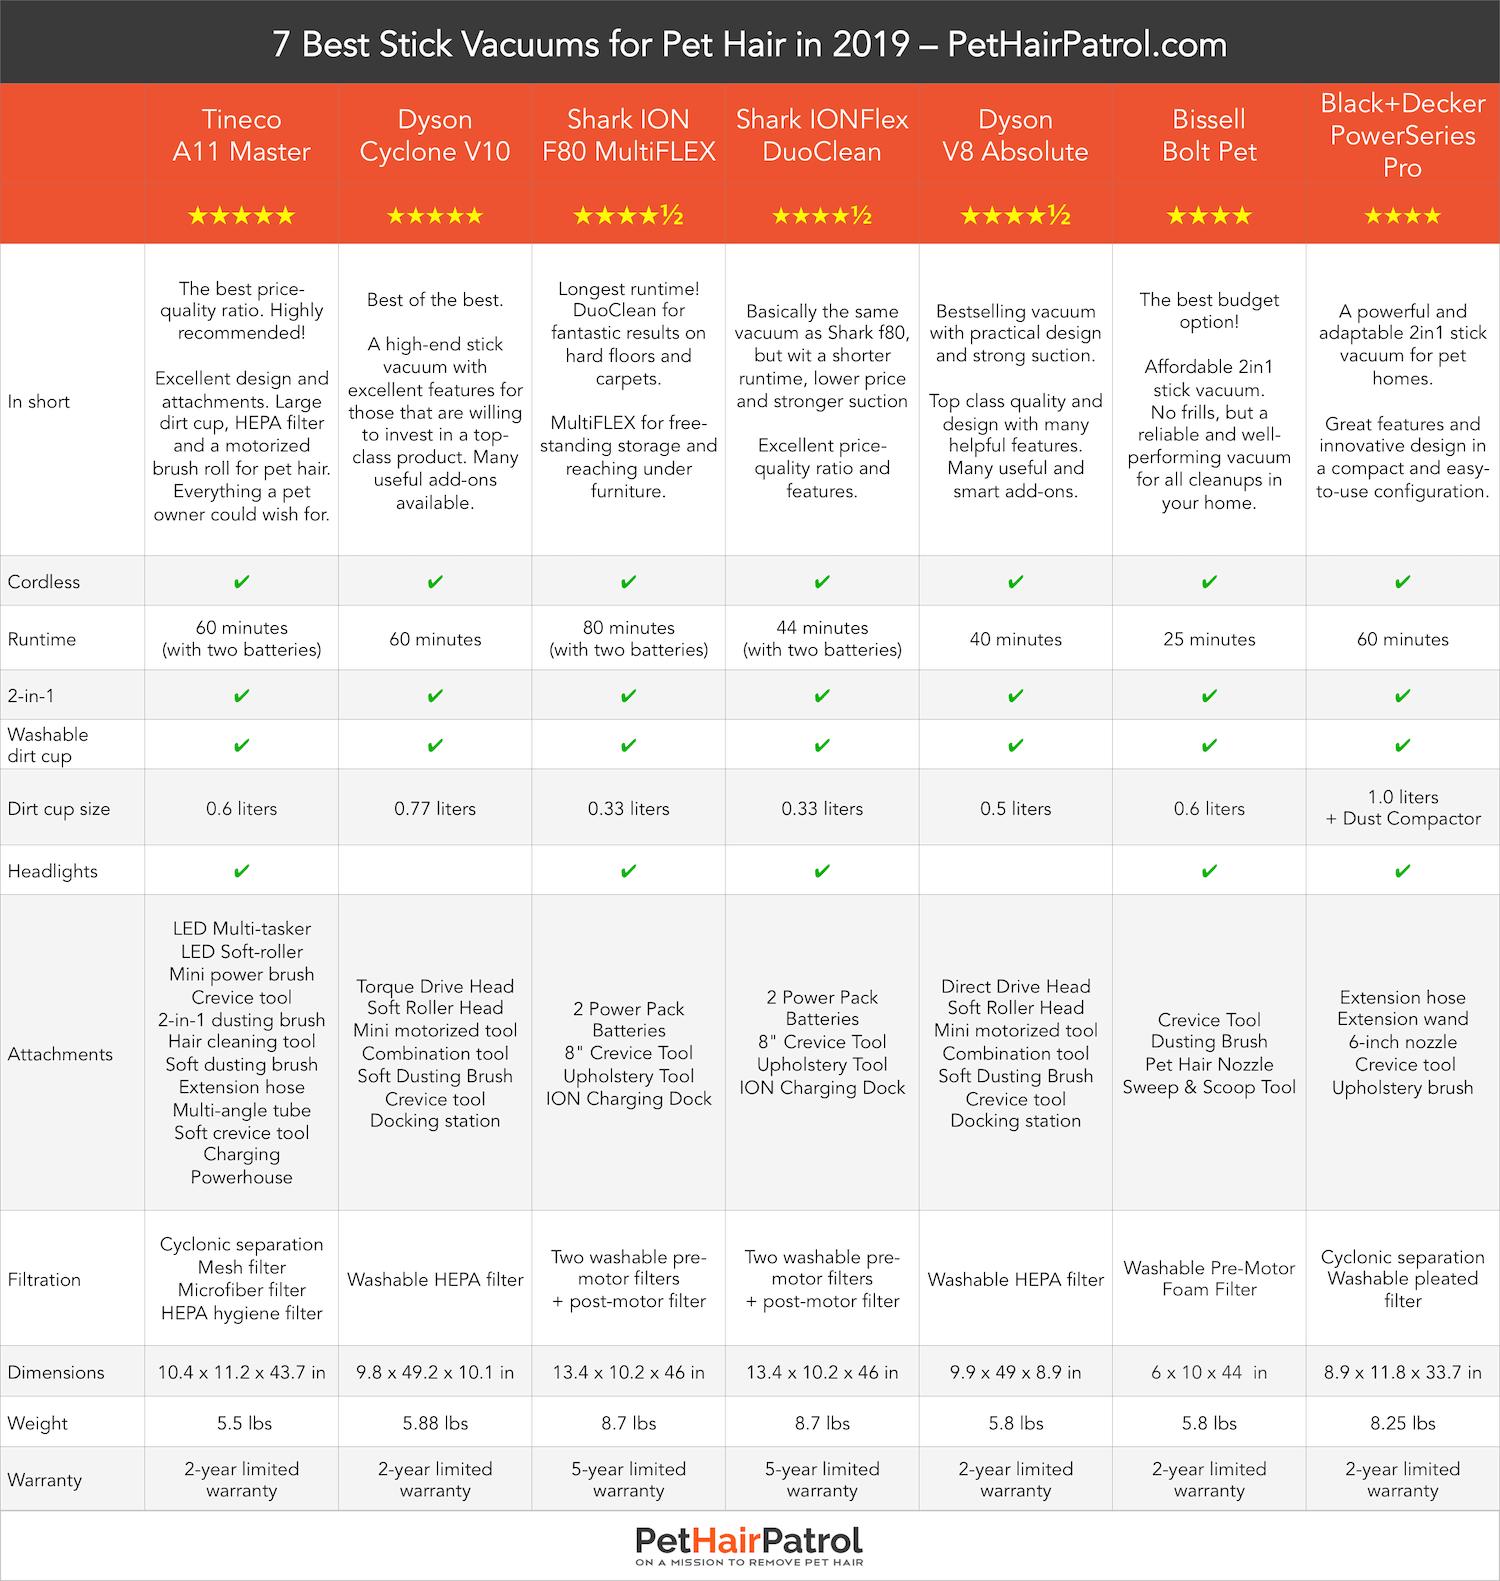 best stick vacuums for pet hair comparison chart PetHairPatrol.com